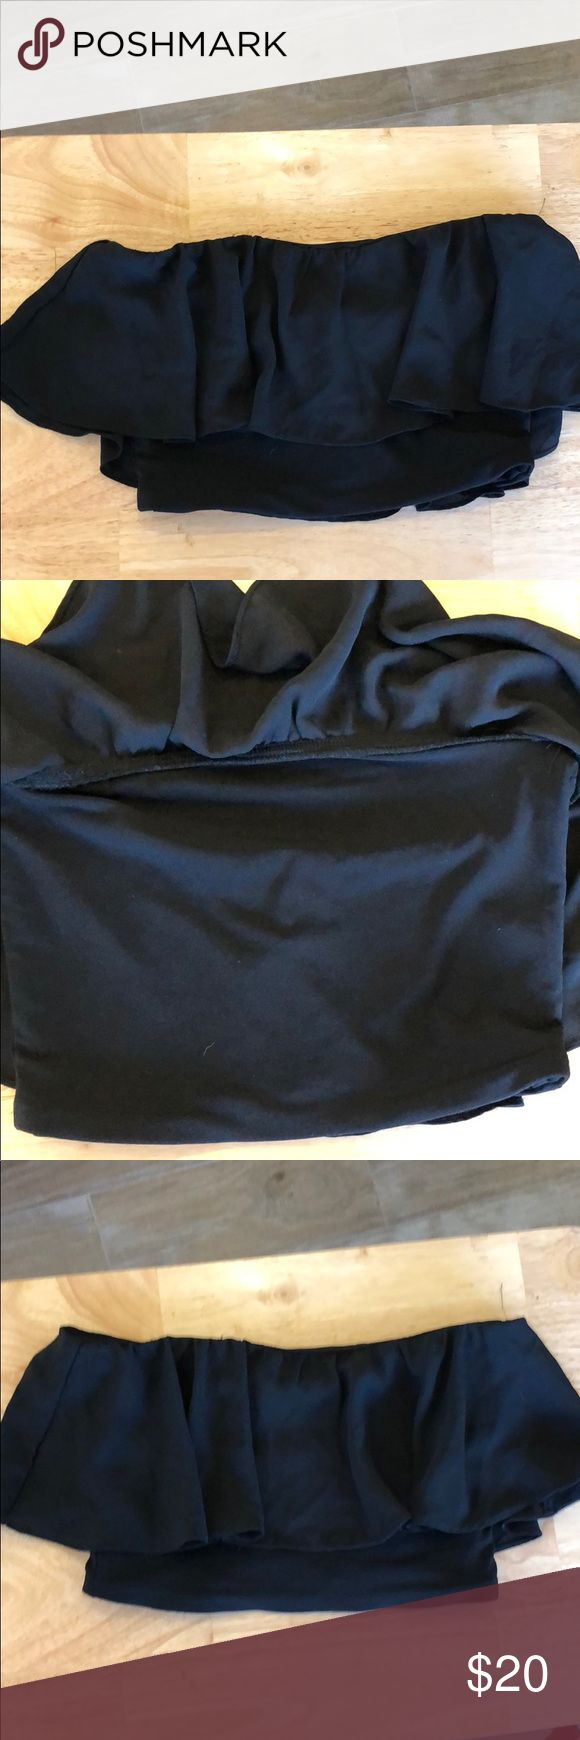 Brand new black  bandeau top by Aqua bandeau Brand new black top by Aqua  Has ruffle around top Retail price $48 Aqua Swim Bikinis